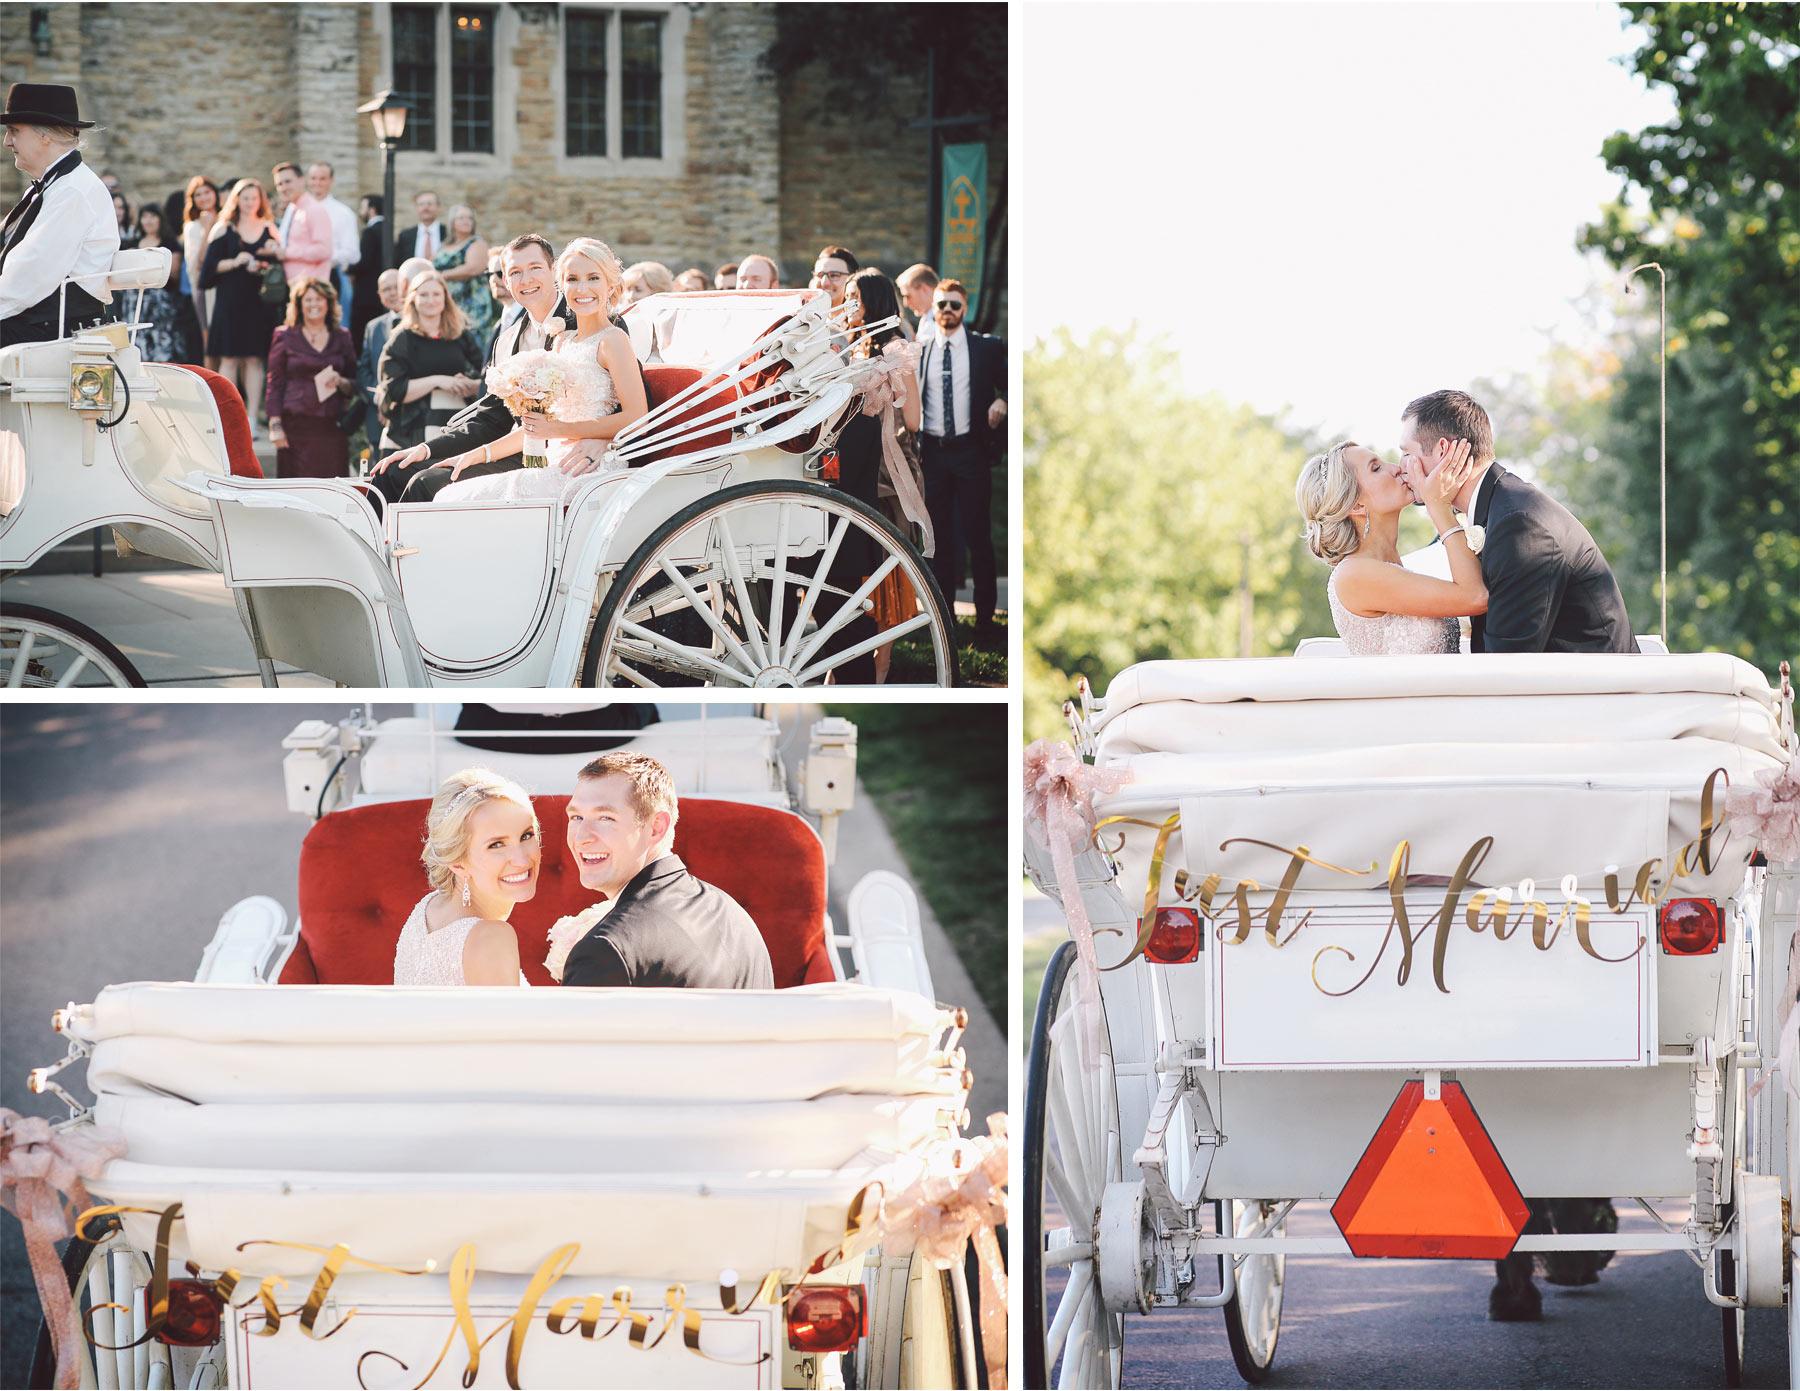 14-Minneapolis-Minnesota-Wedding-Photography-by-Vick-Photography-Ceremony-Lake-of-the-Isles-Lutheran-Church-Horse-Carraige-Send-Off-Jenna-and-Josh.jpg